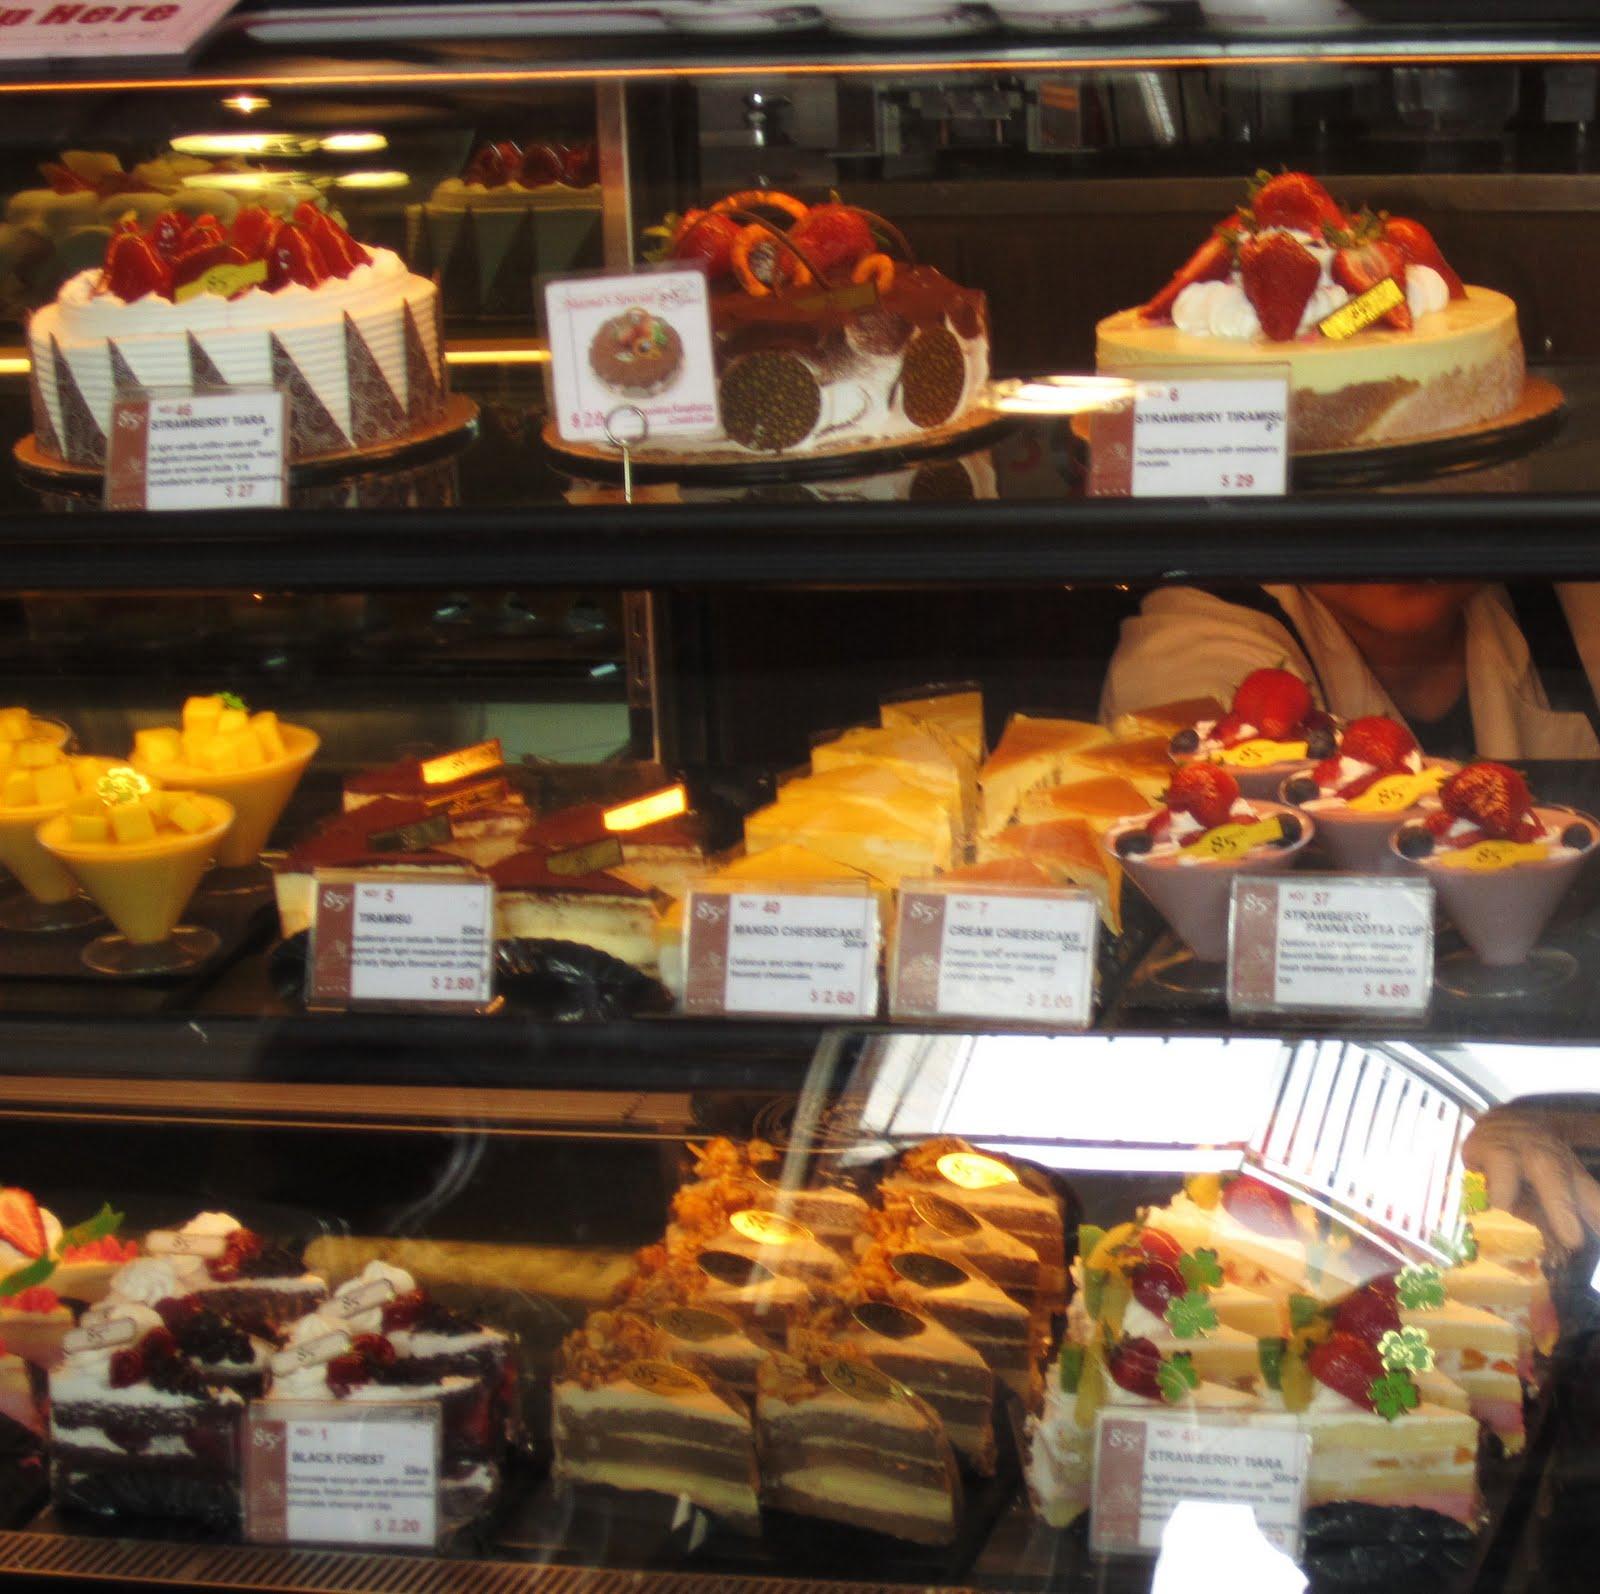 Revolving Styles Vintage: 85°C Bakery Cafe